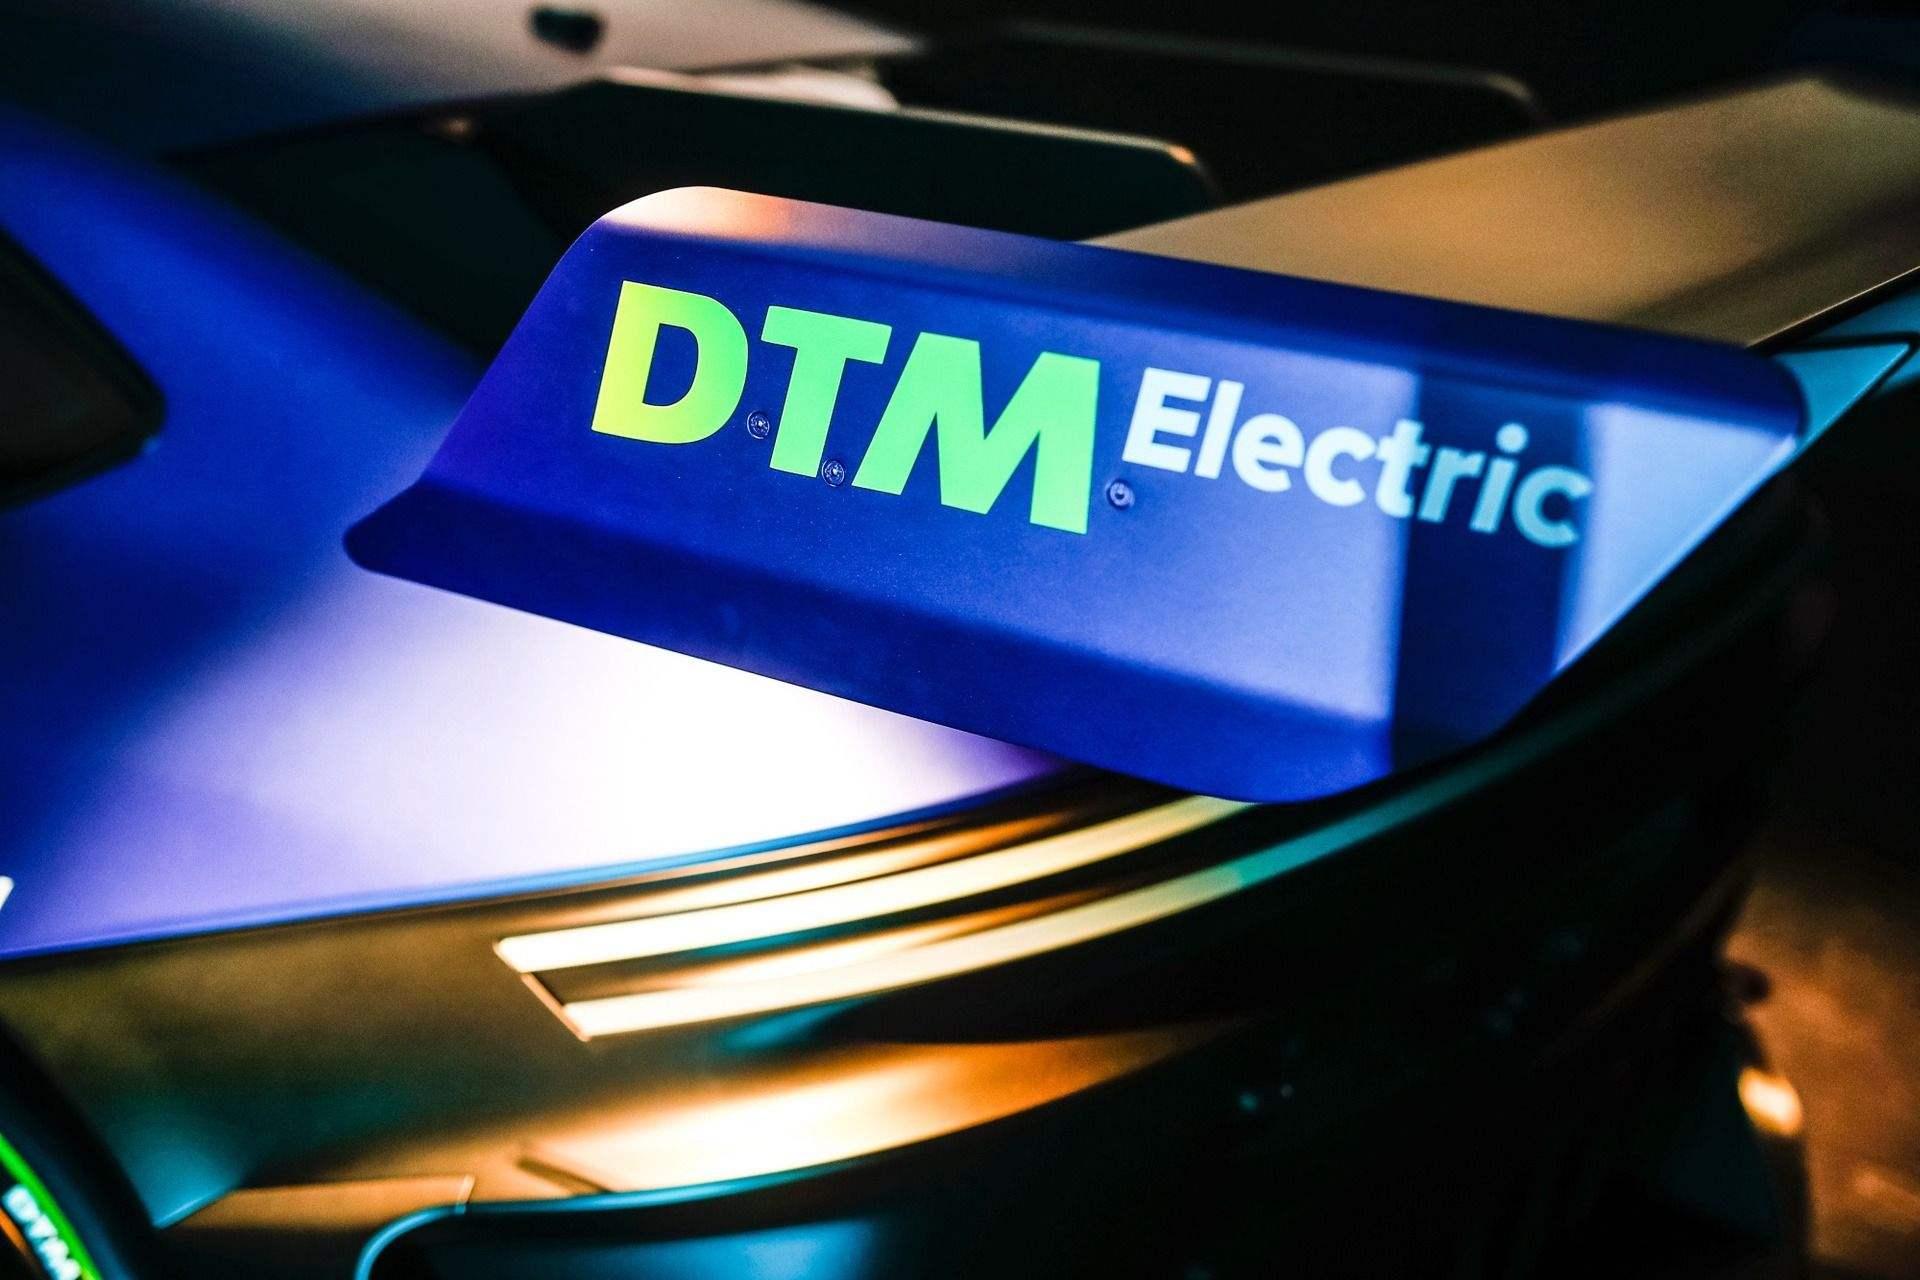 2023_DTM_Electric_0006